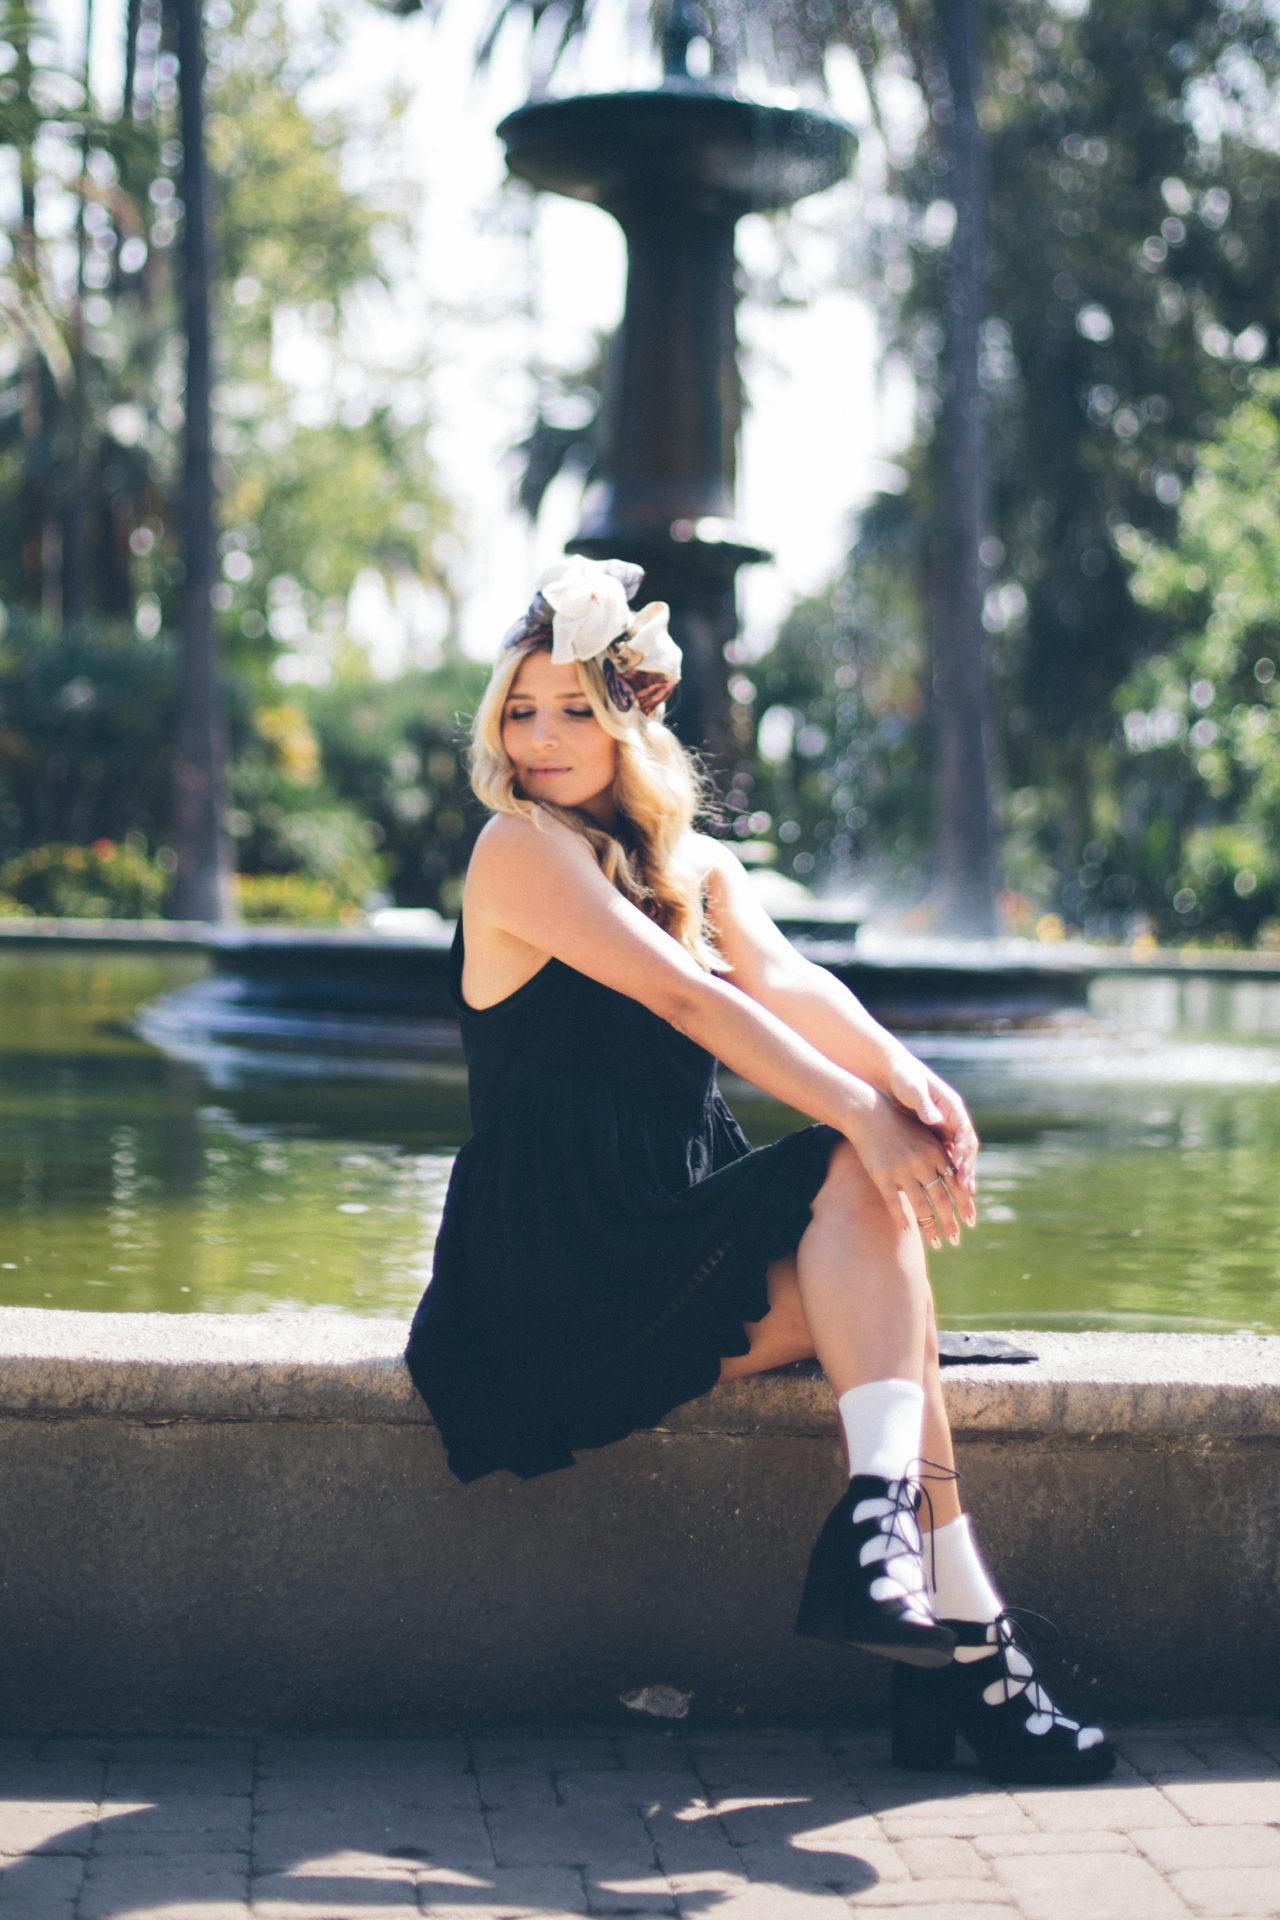 MrKate_TARGET_Beauty_JUNE (88 of 163)